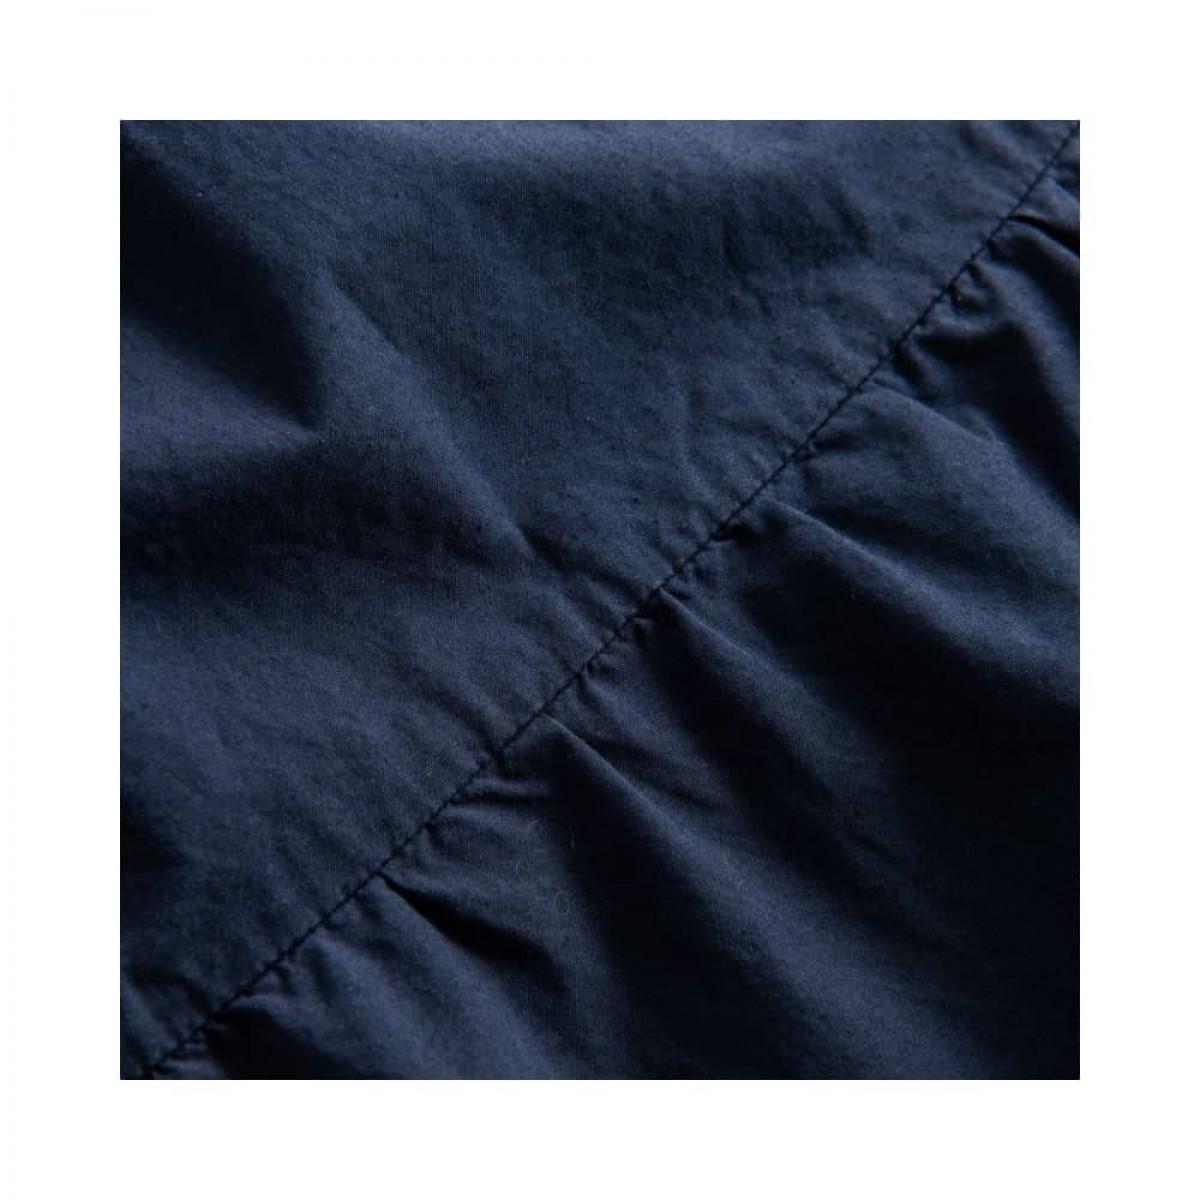 paprika nederdel - dark navy - skæring detalje